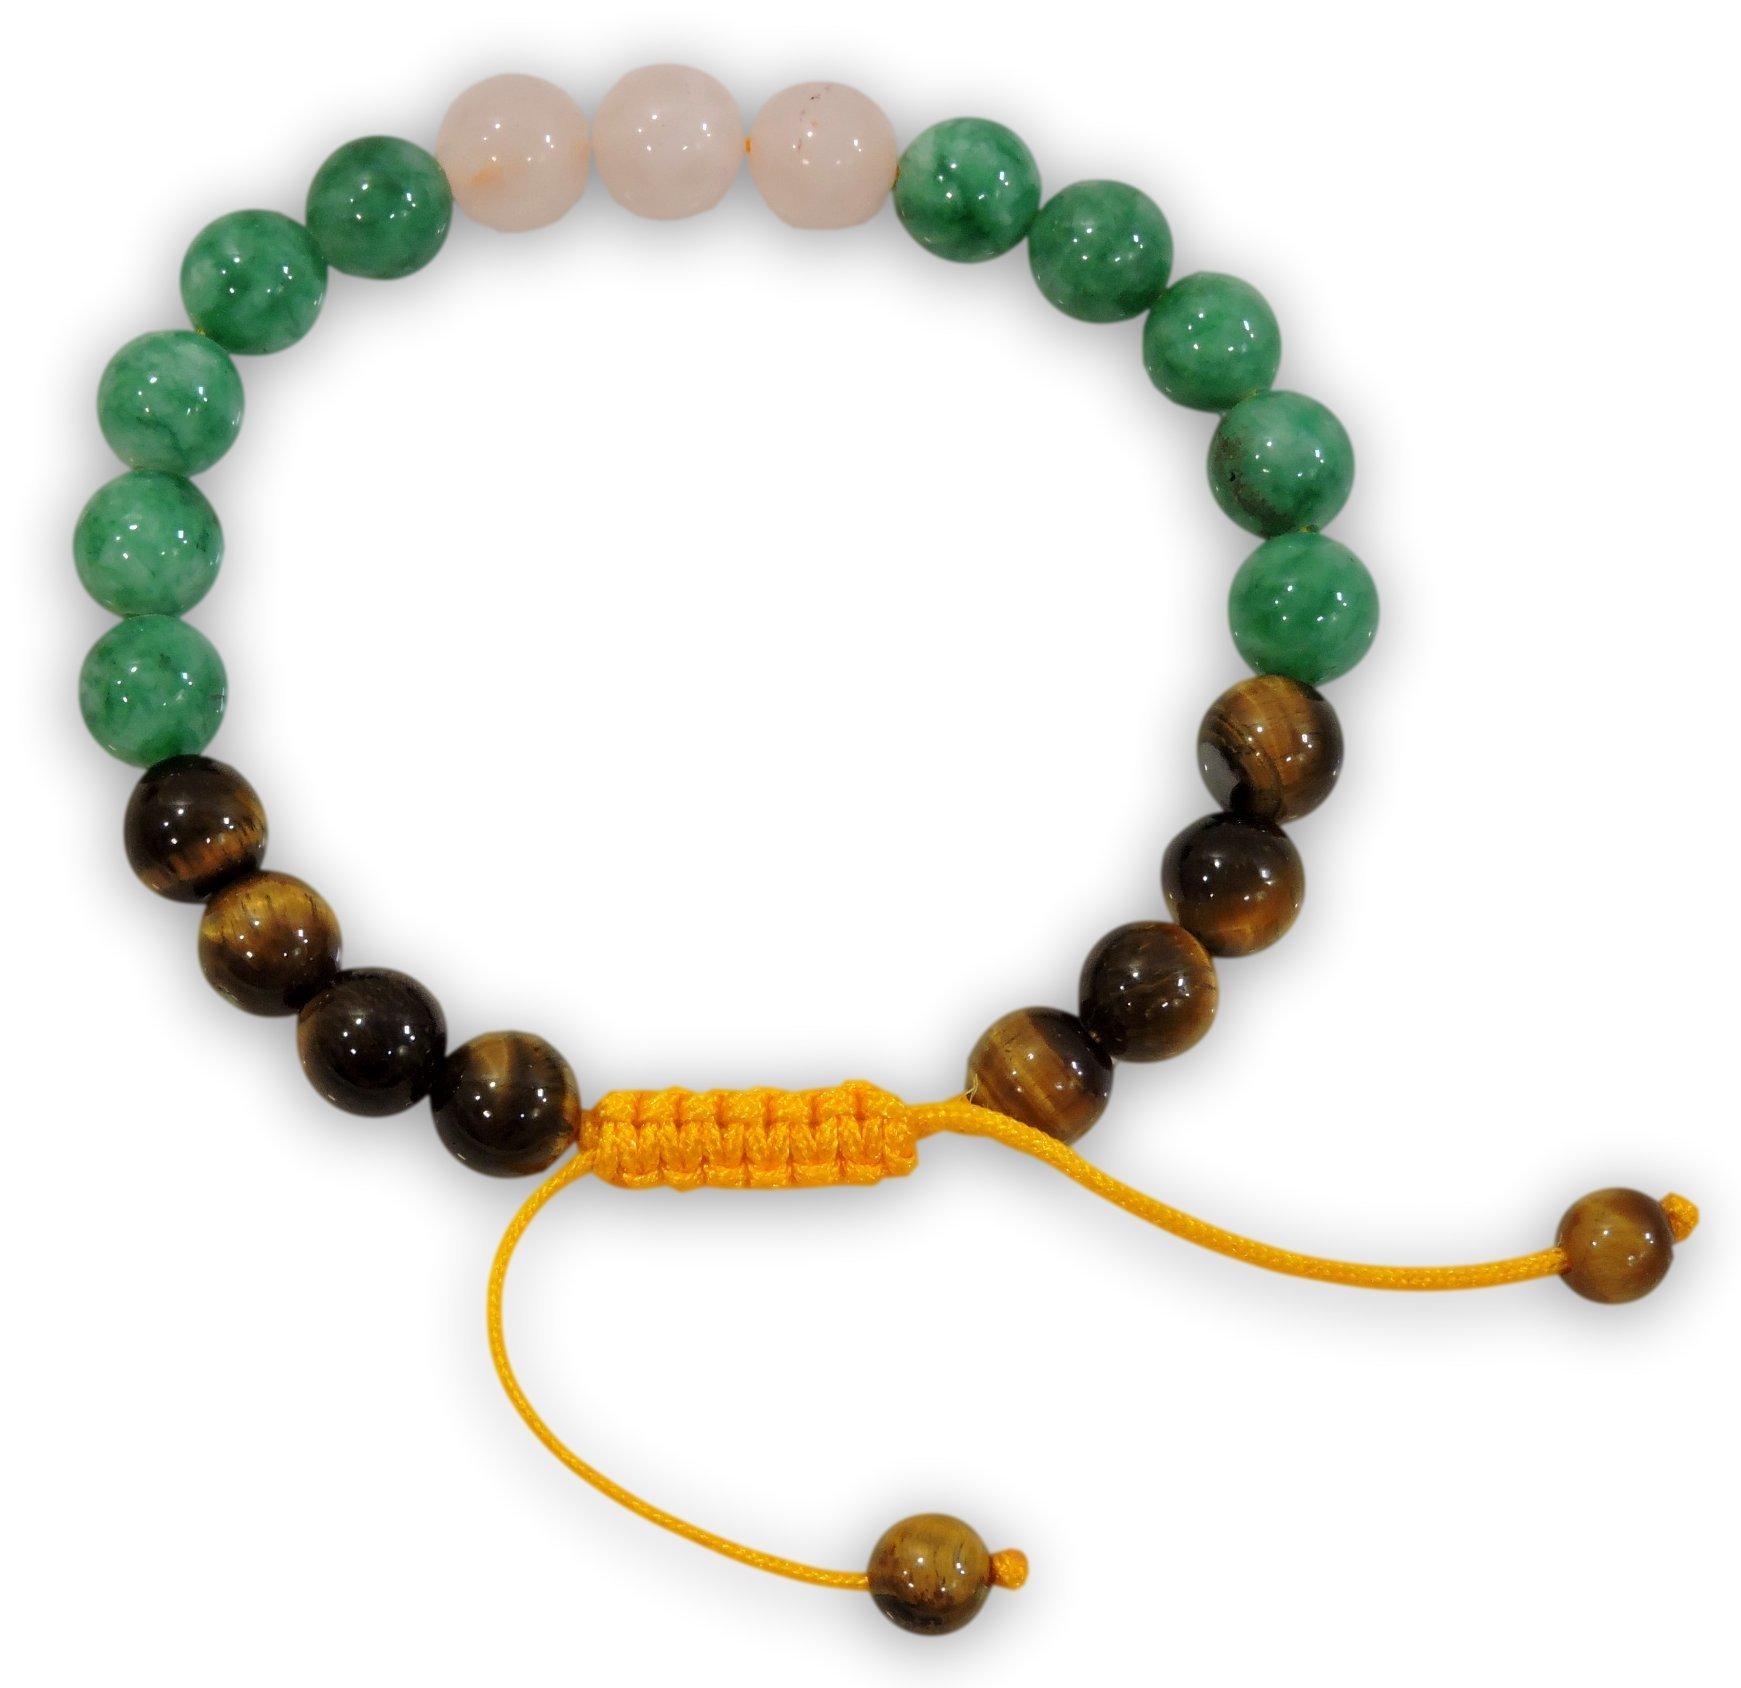 Hands Of Tibet Tibetan Mala Tiger Eye Green Jade Rose Quartz Wrist Mala Yoga Bracelet